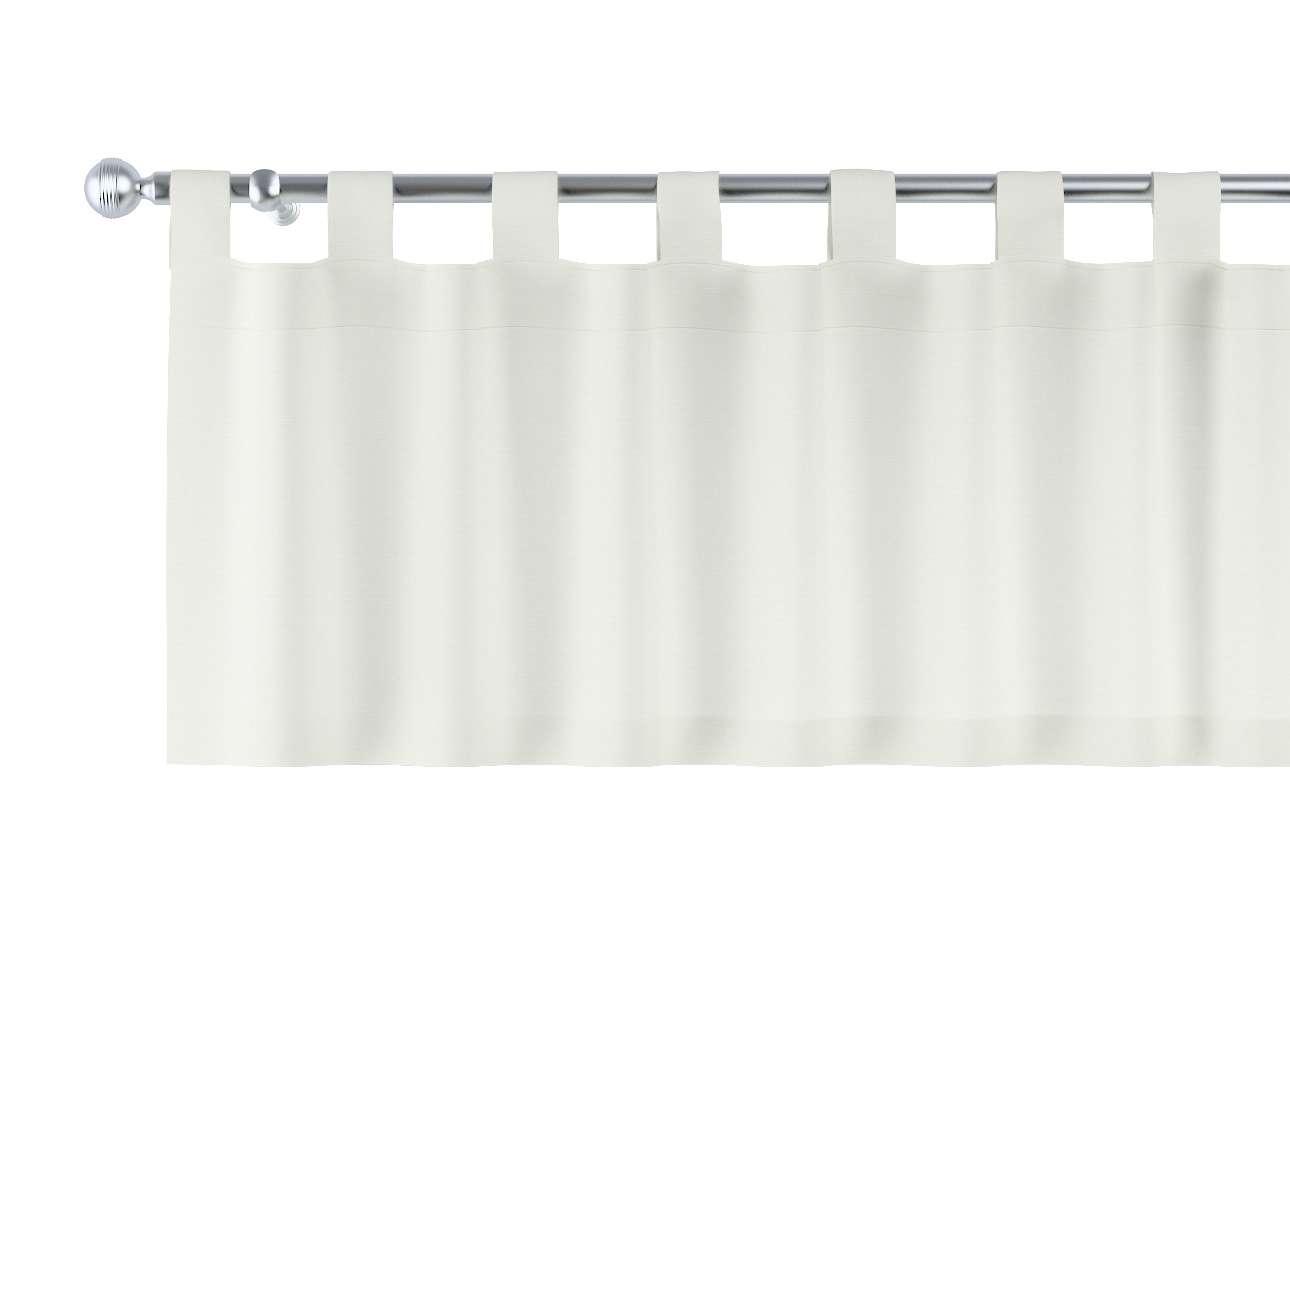 Lambrekin na szelkach 130x40cm w kolekcji Jupiter, tkanina: 127-00